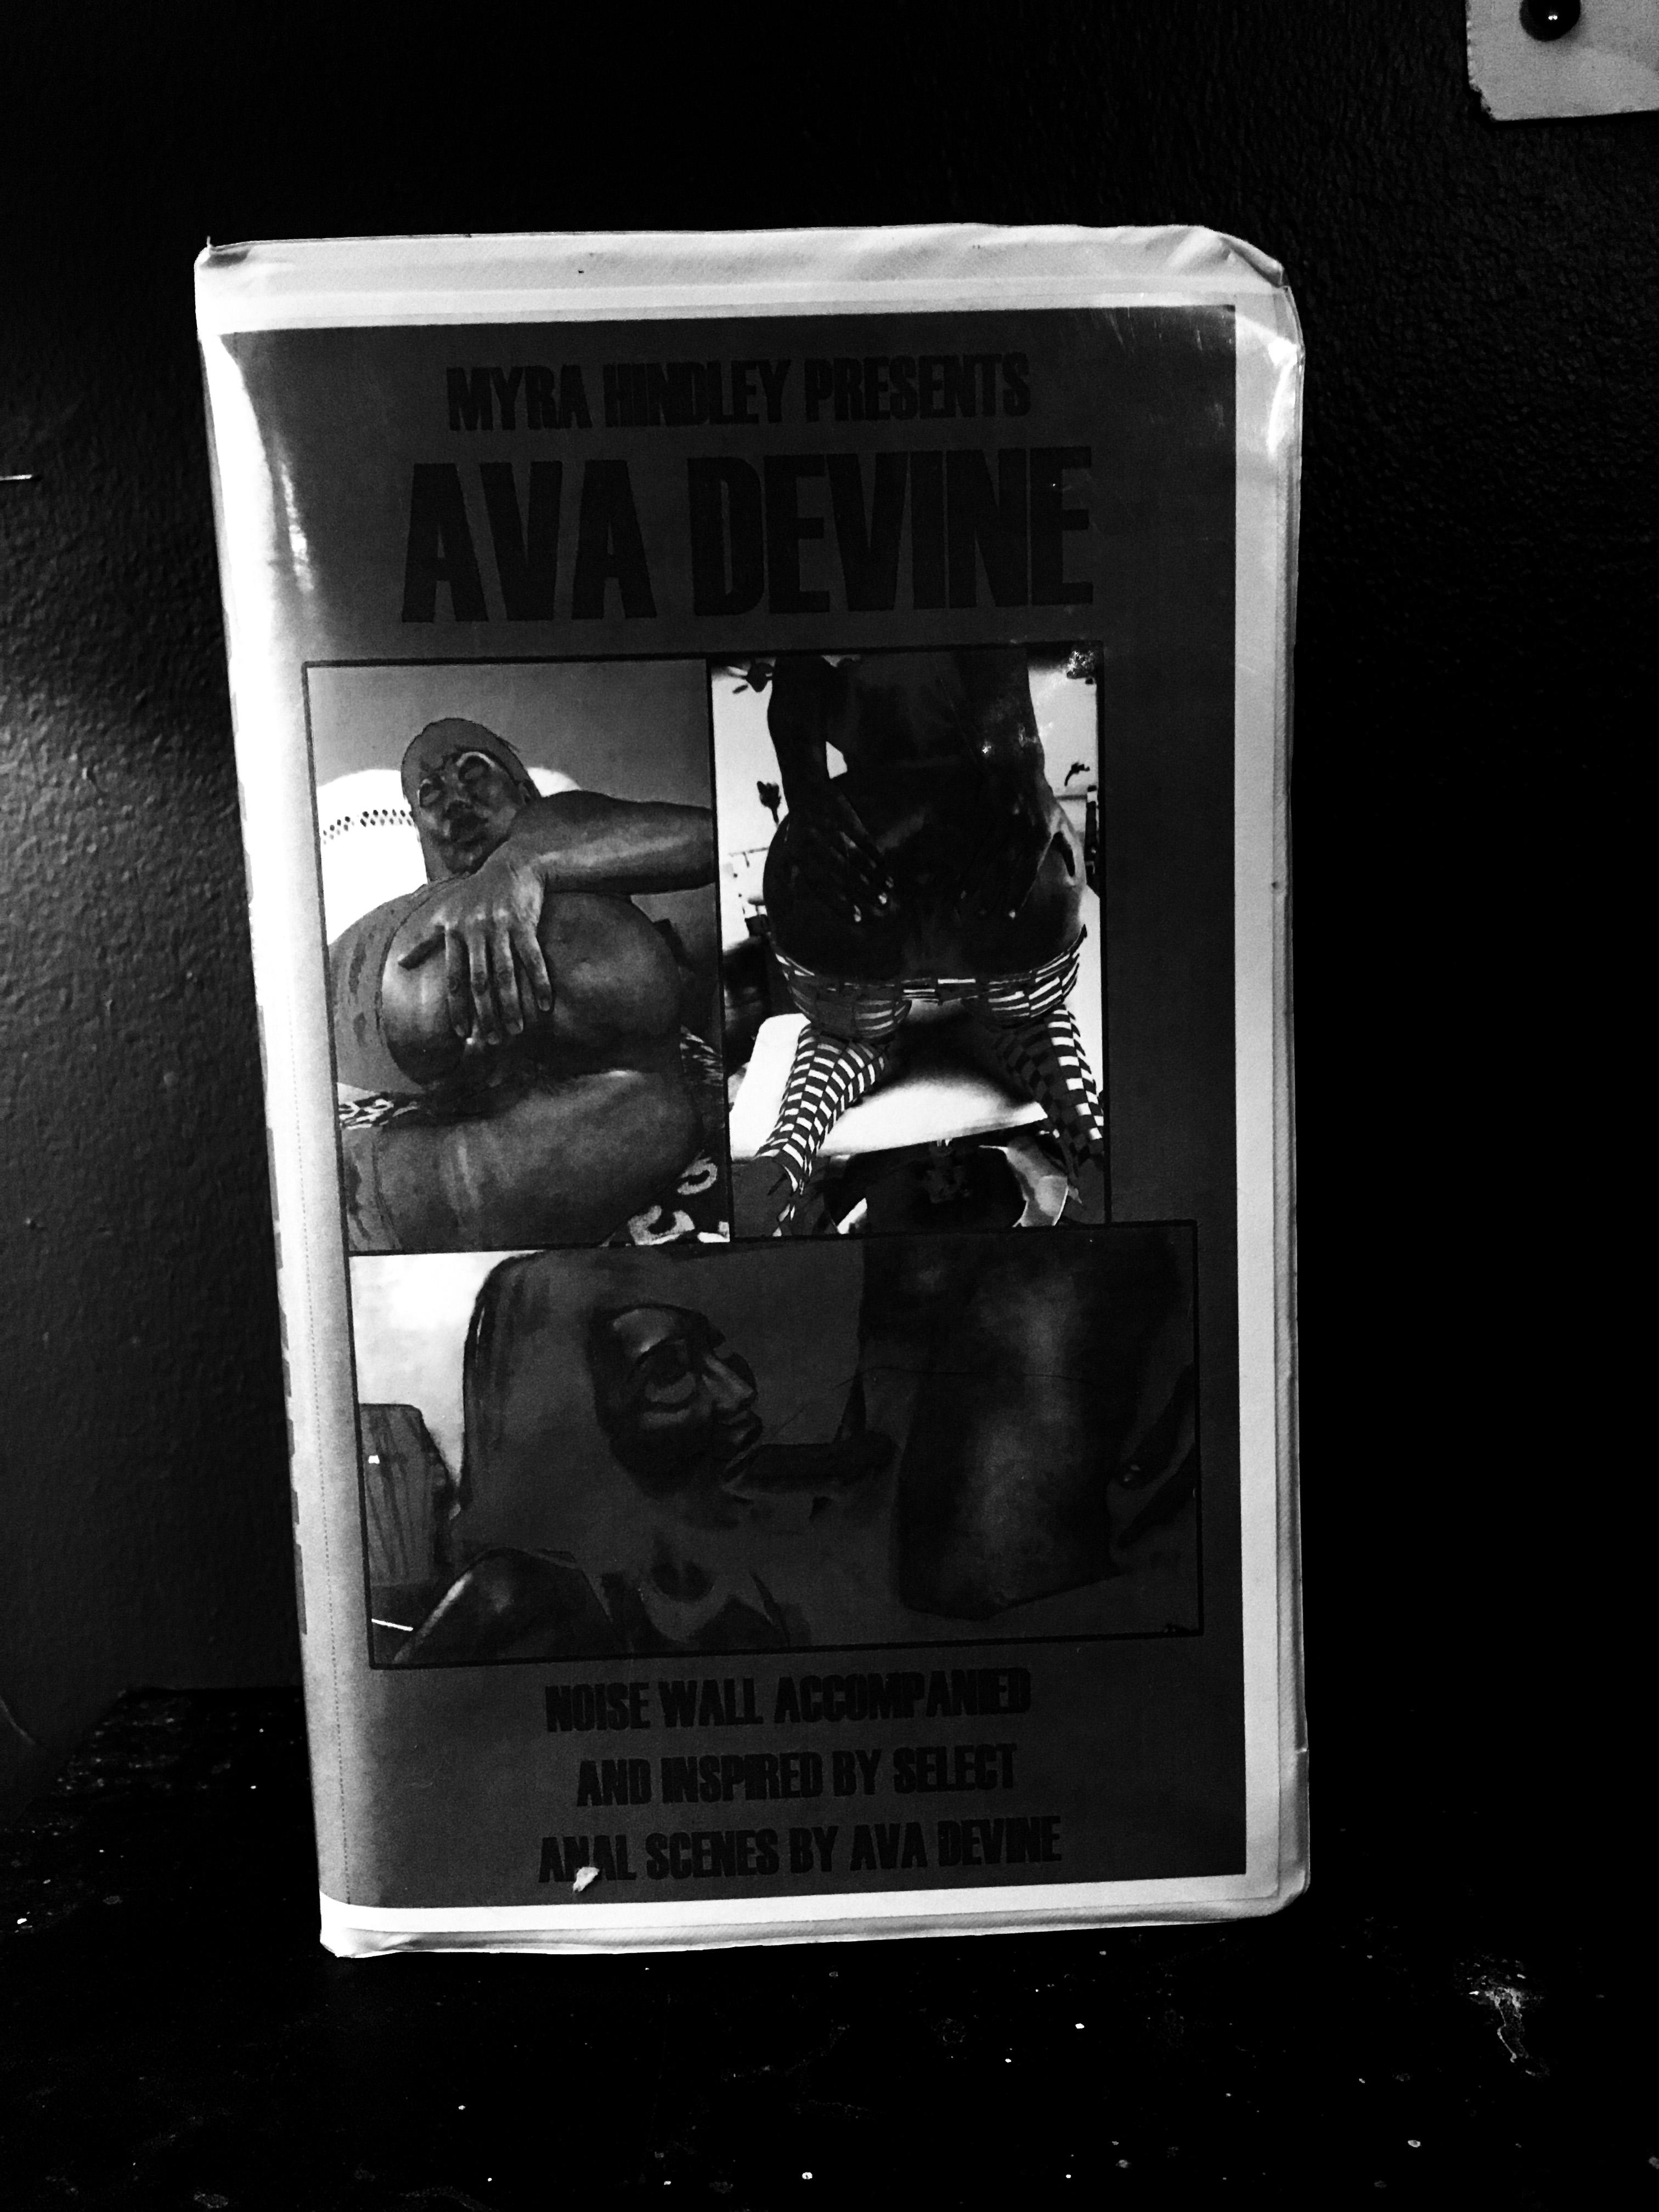 Ava Devine myra hindley presents - ava devine [vhs] soldhypodermic apothecray